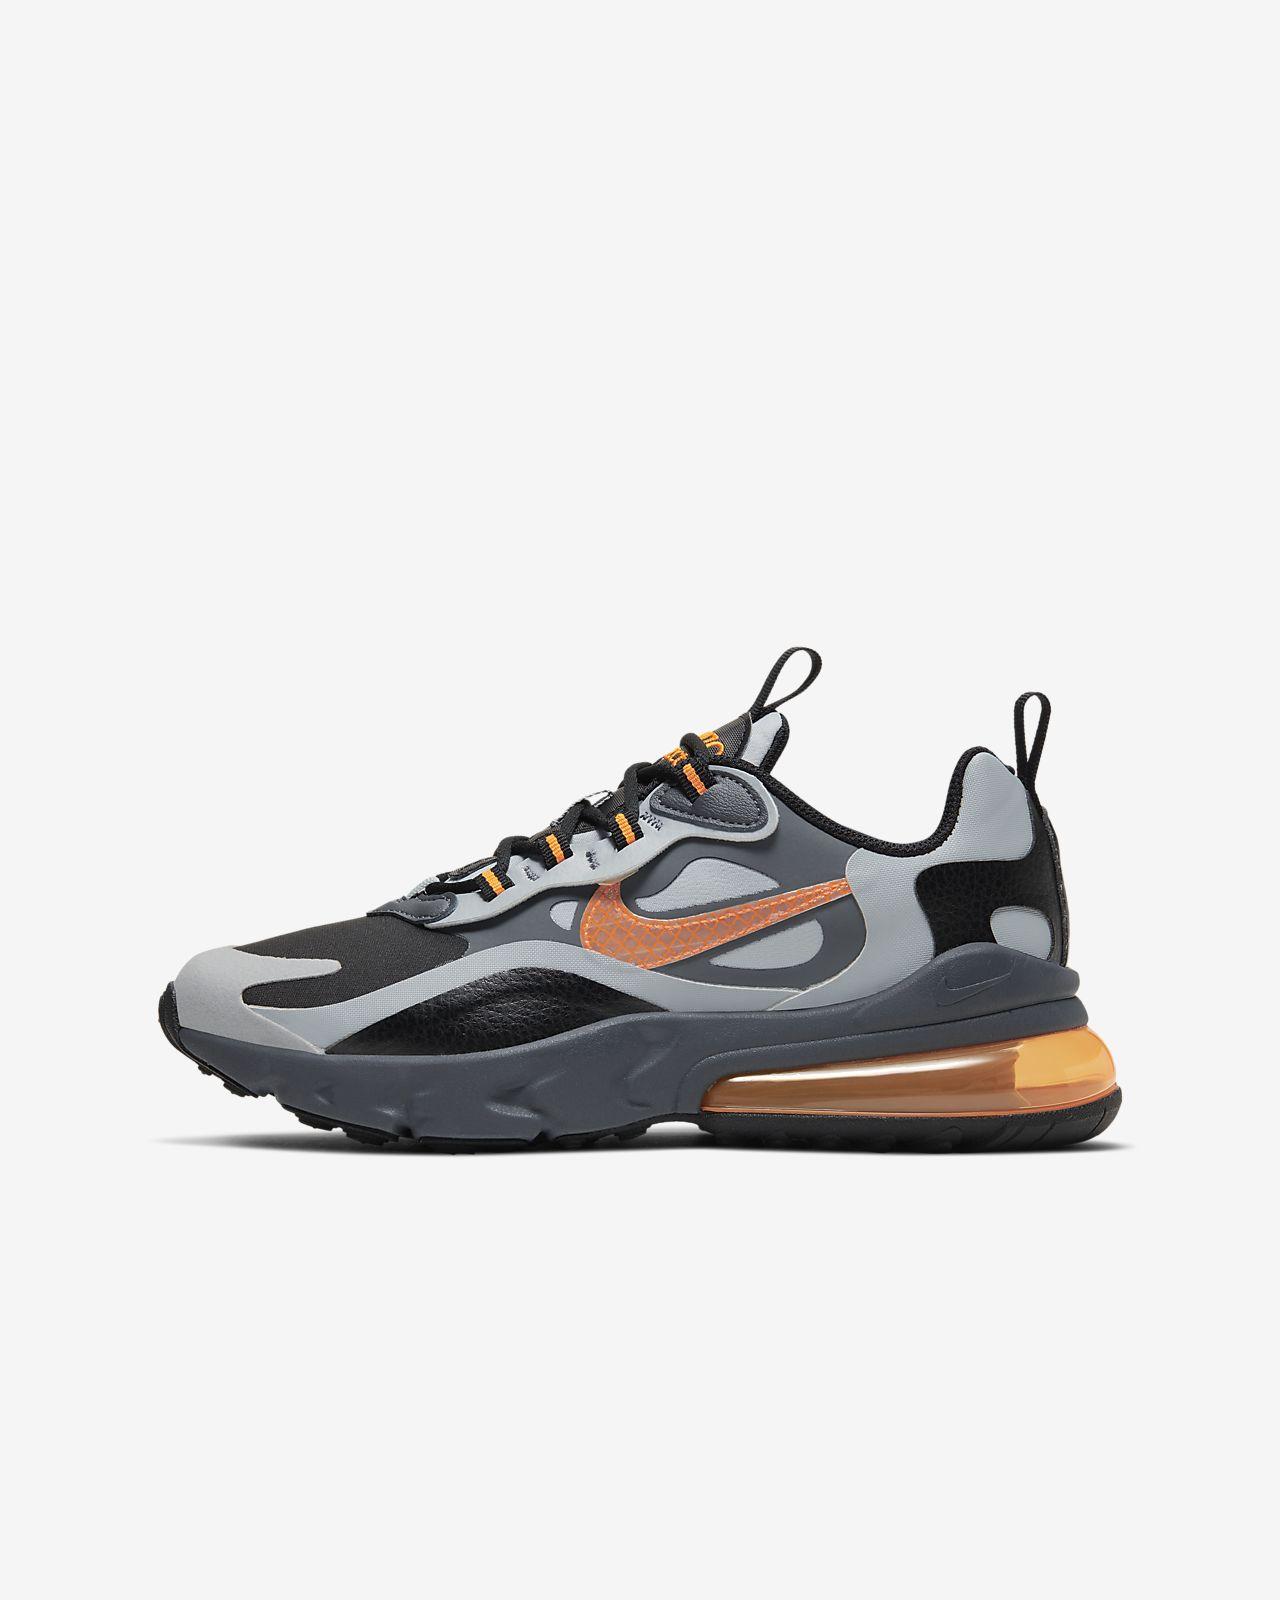 Nike Air Max 270 React Shoes